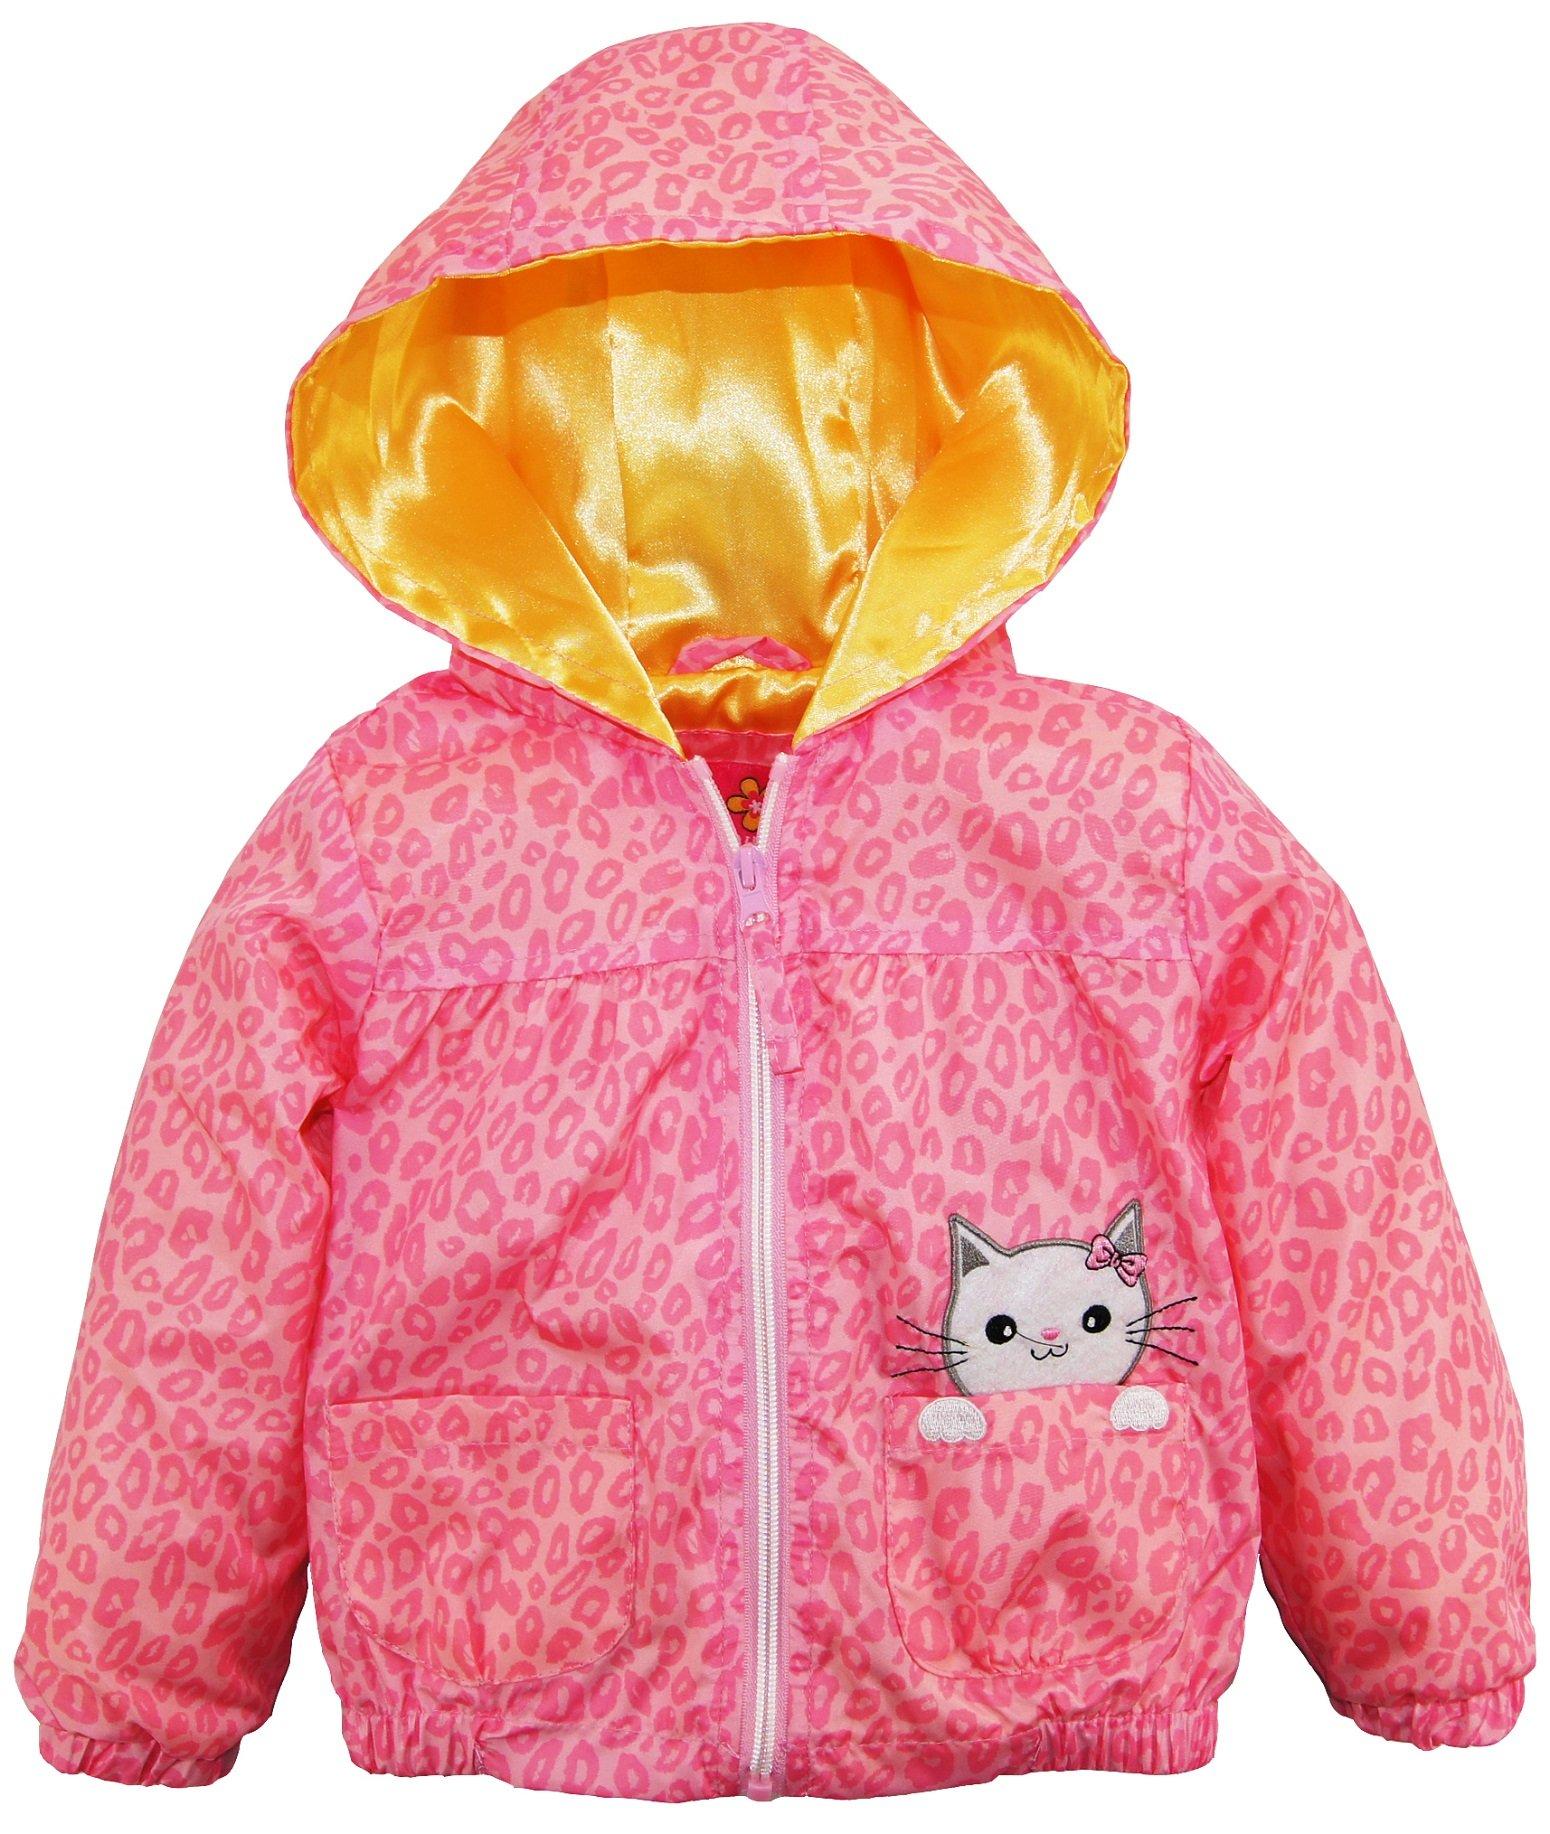 Pink Platinum Little Girls Cheetah Kitty Windbreaker Jacket Hooded Spring Coat, Pink, 4T